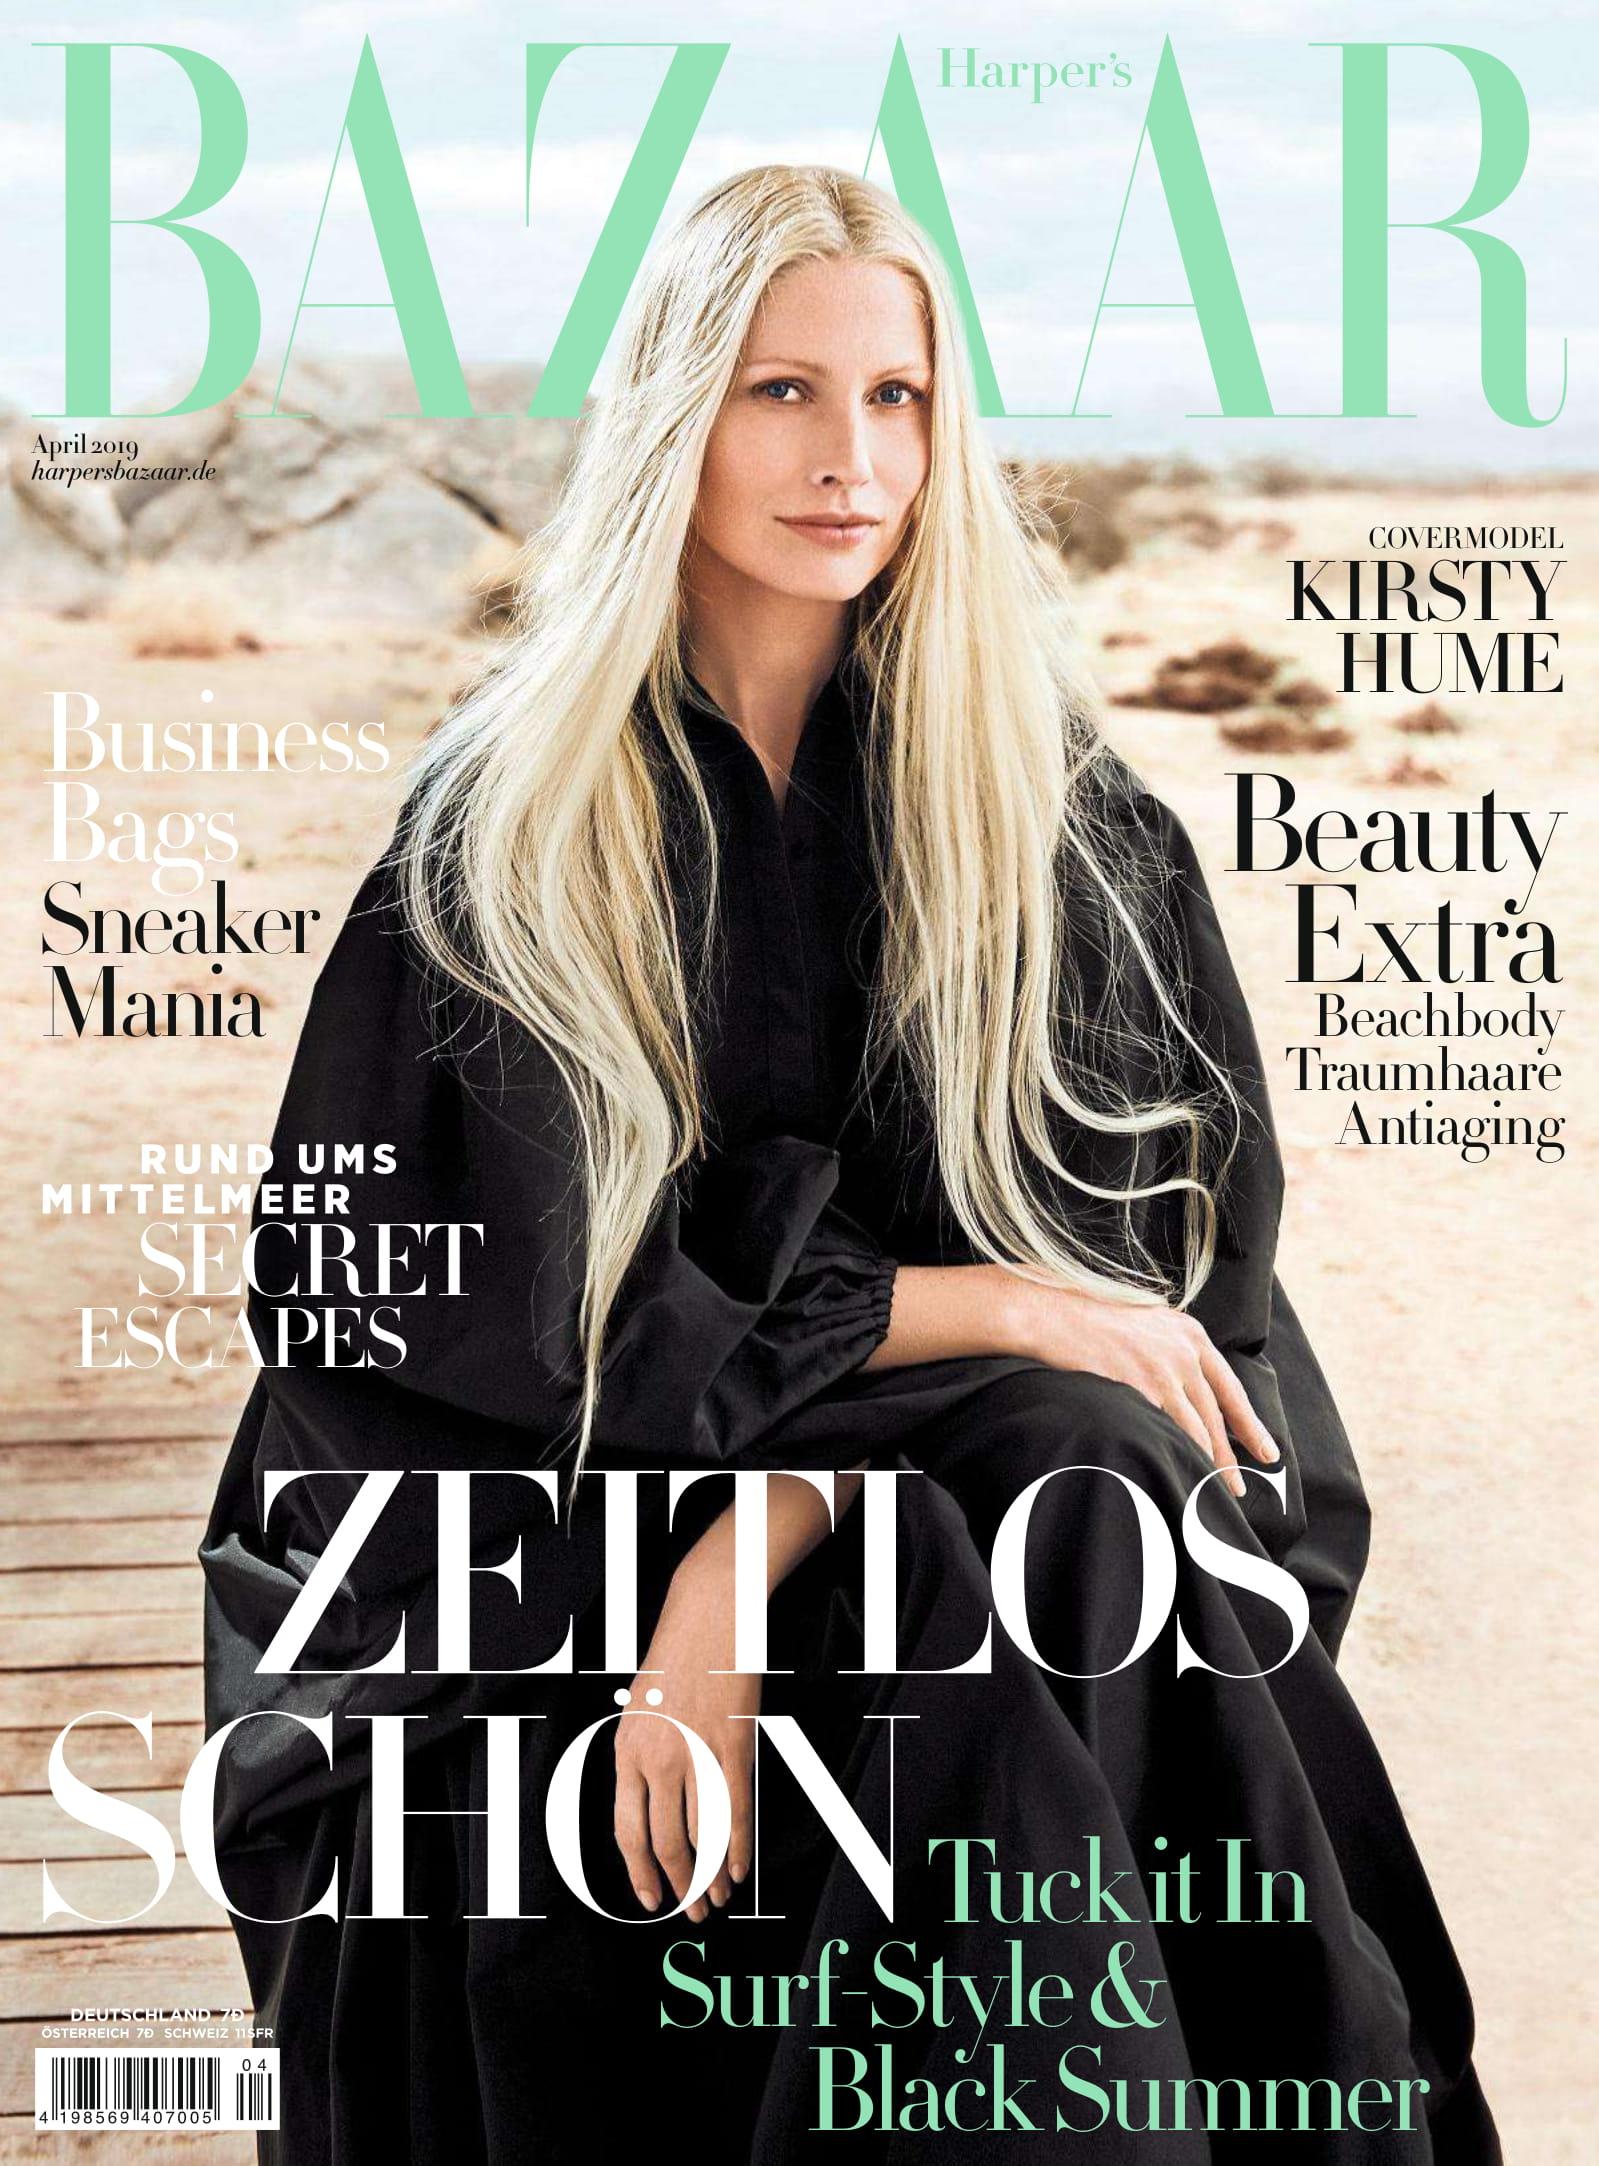 Kirsty-Hume-Regan-Cameron-Harpers-Bazaar-Germany-April-2019- (3).jpg